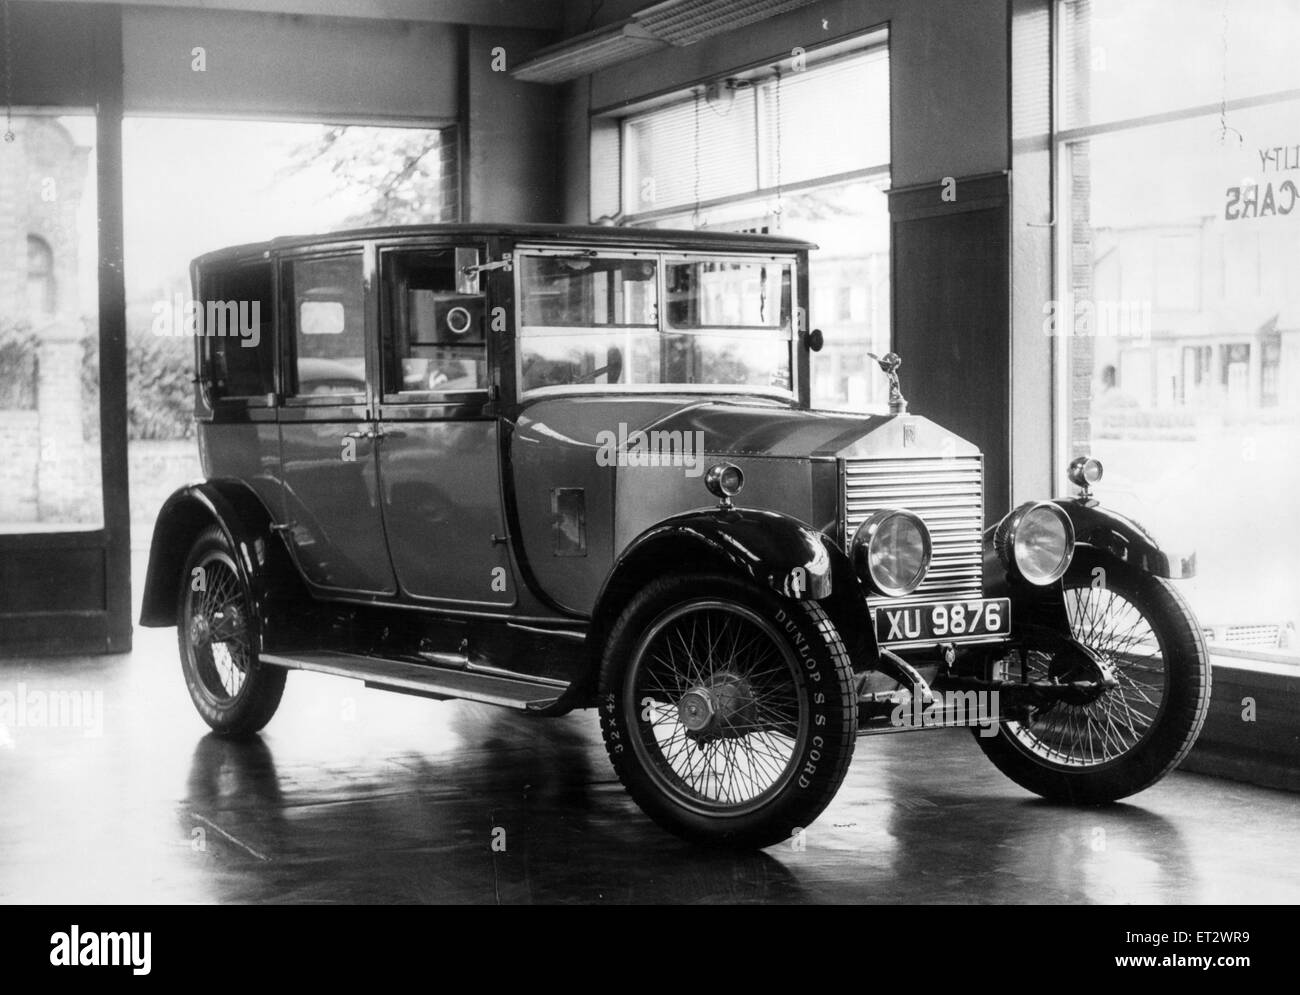 1924 Landaulette Rolls Royce Thompson Hart At Breckon